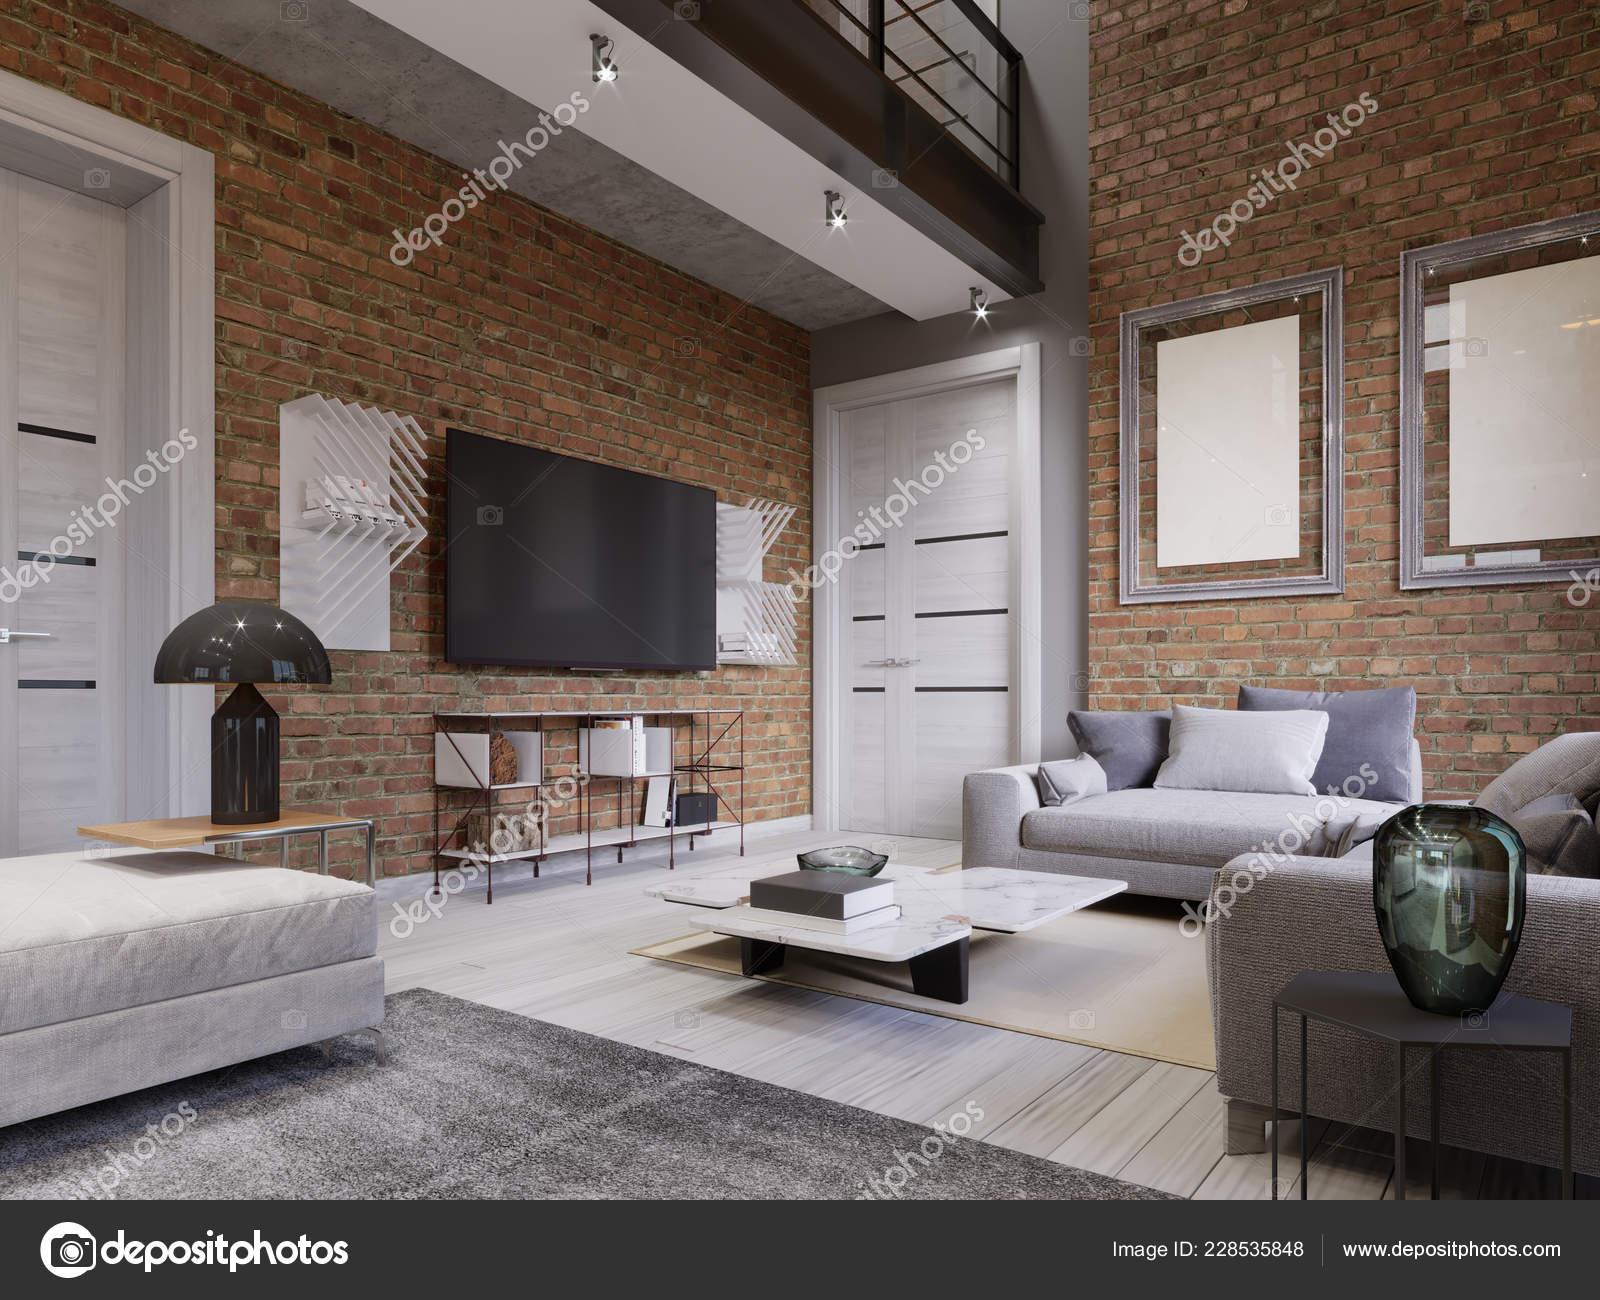 Led Stand Background Brick Wall Loft Apartment Living Room Rendering Stock Photo C Kuprin33 228535848